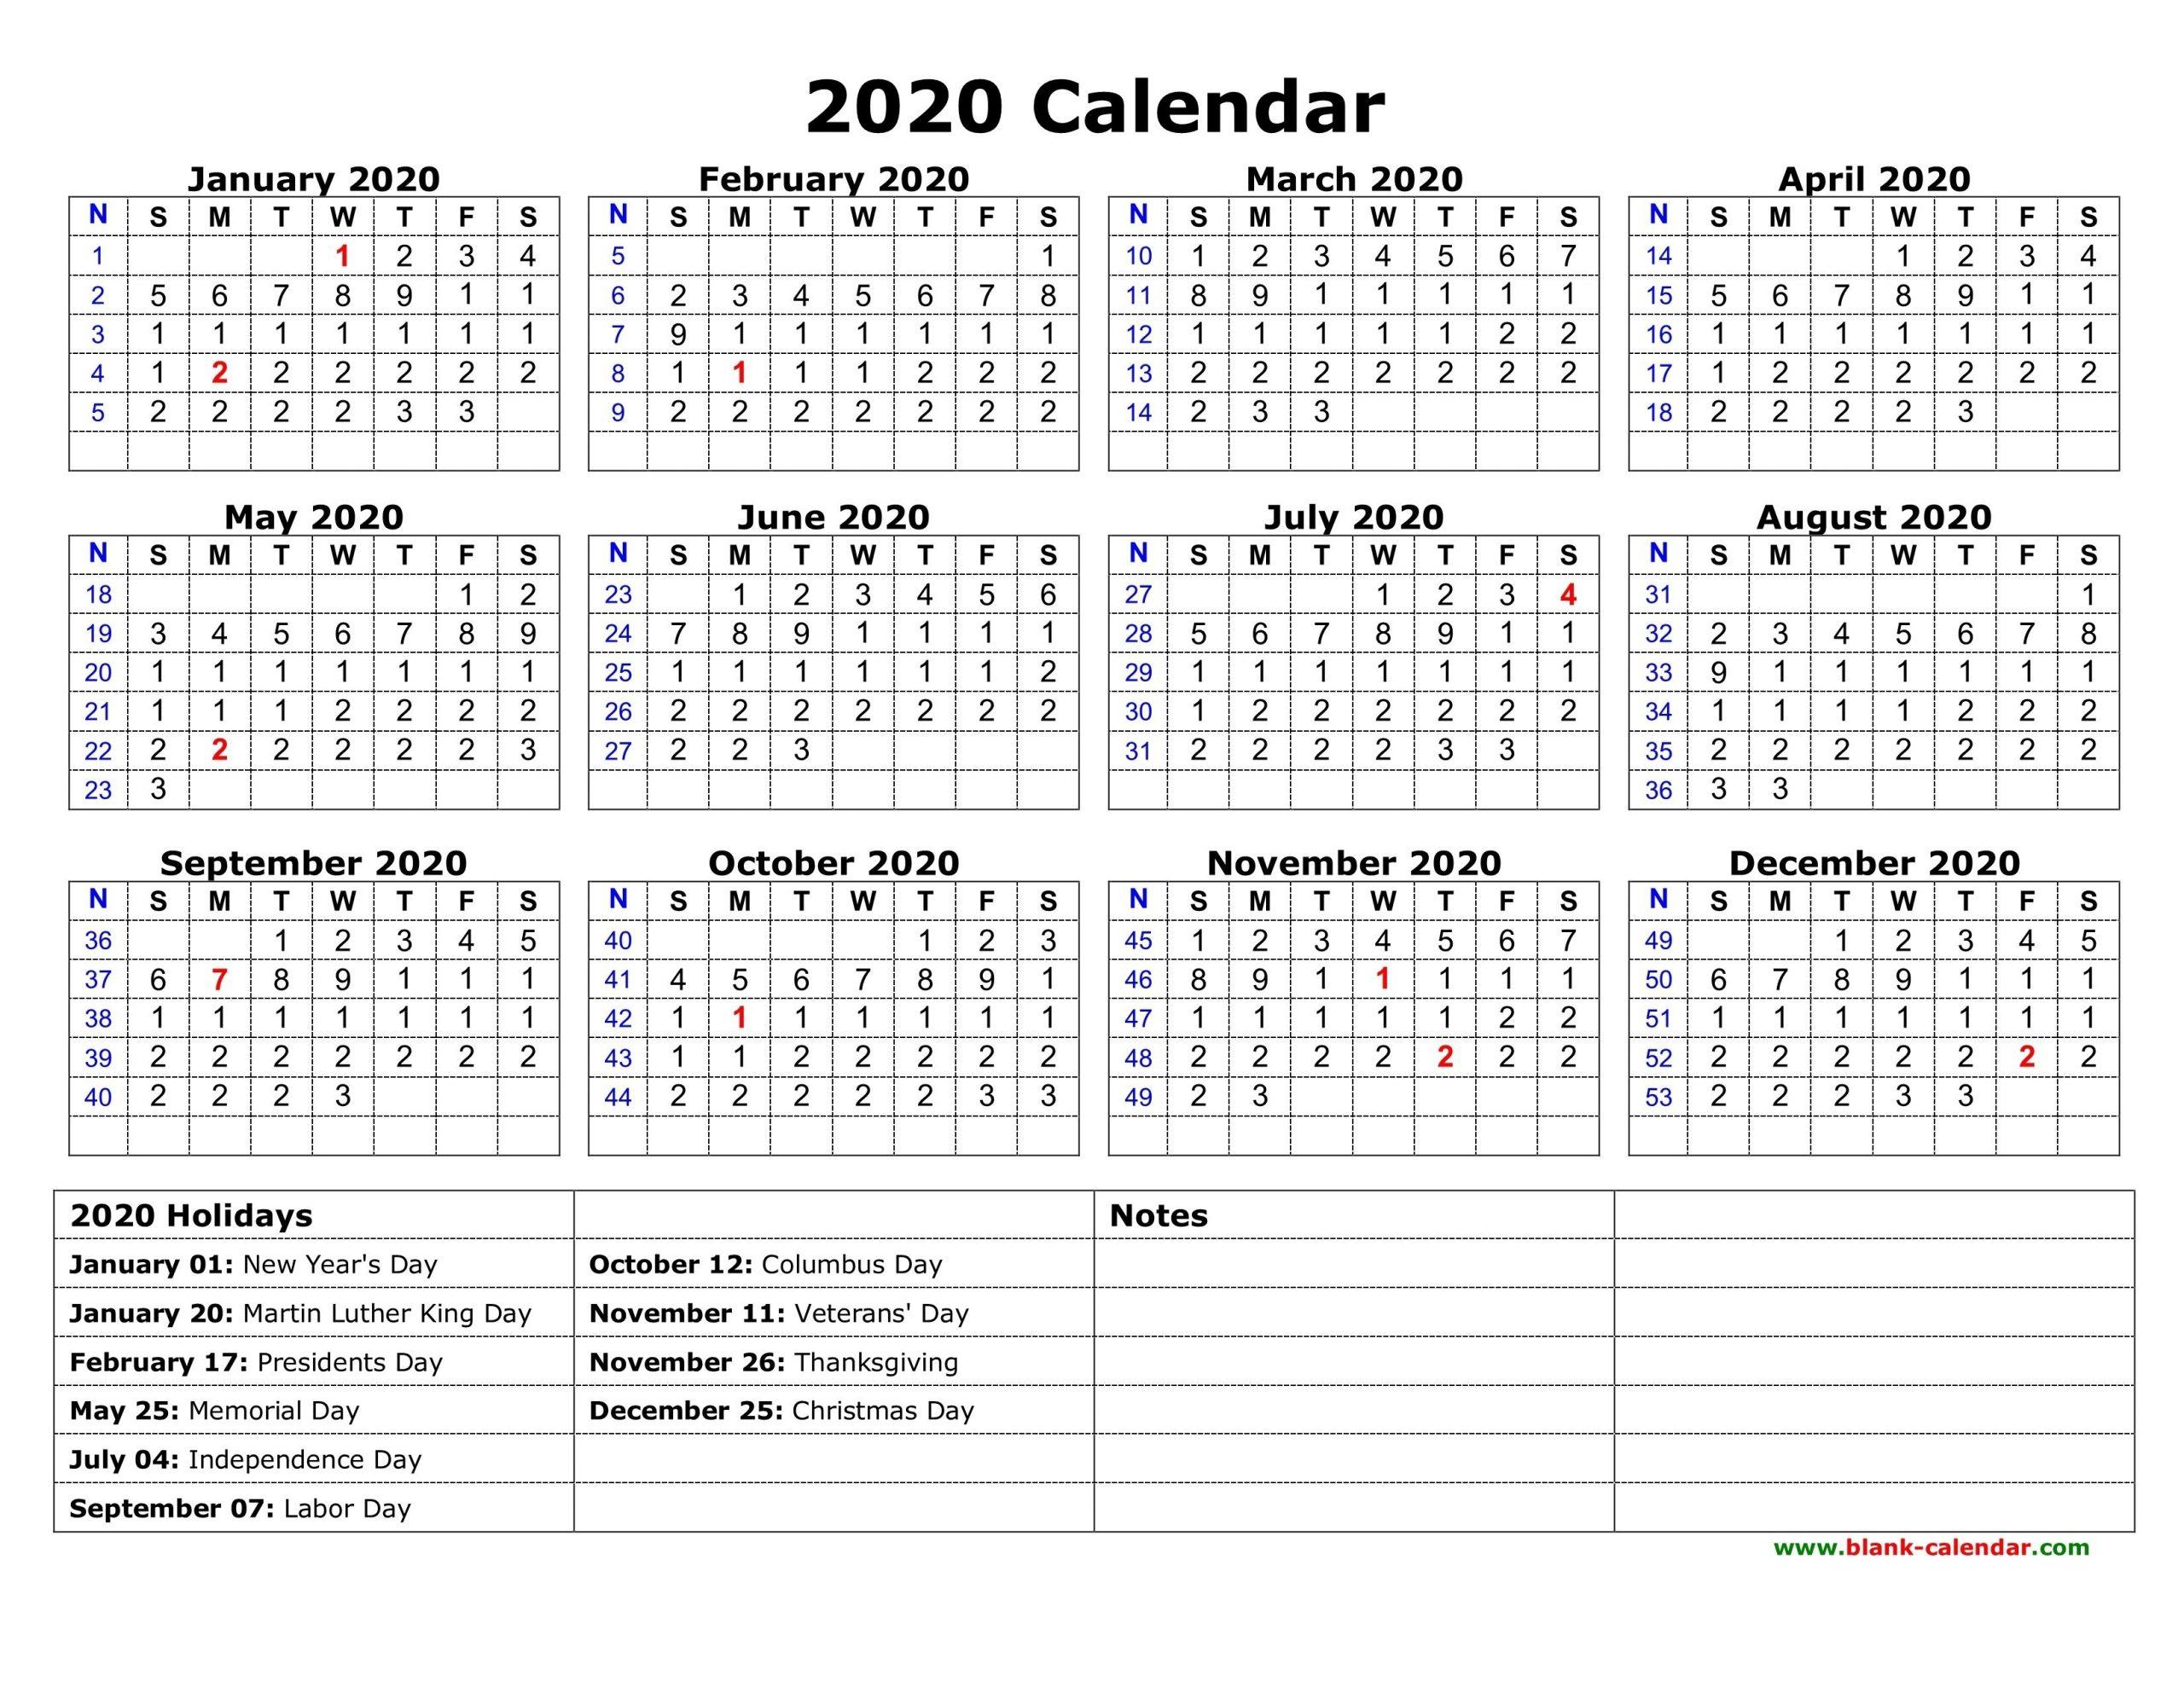 Free Printable Calendars 2020 With Holidays | Qualads Holiday Time Off Calendar Excel